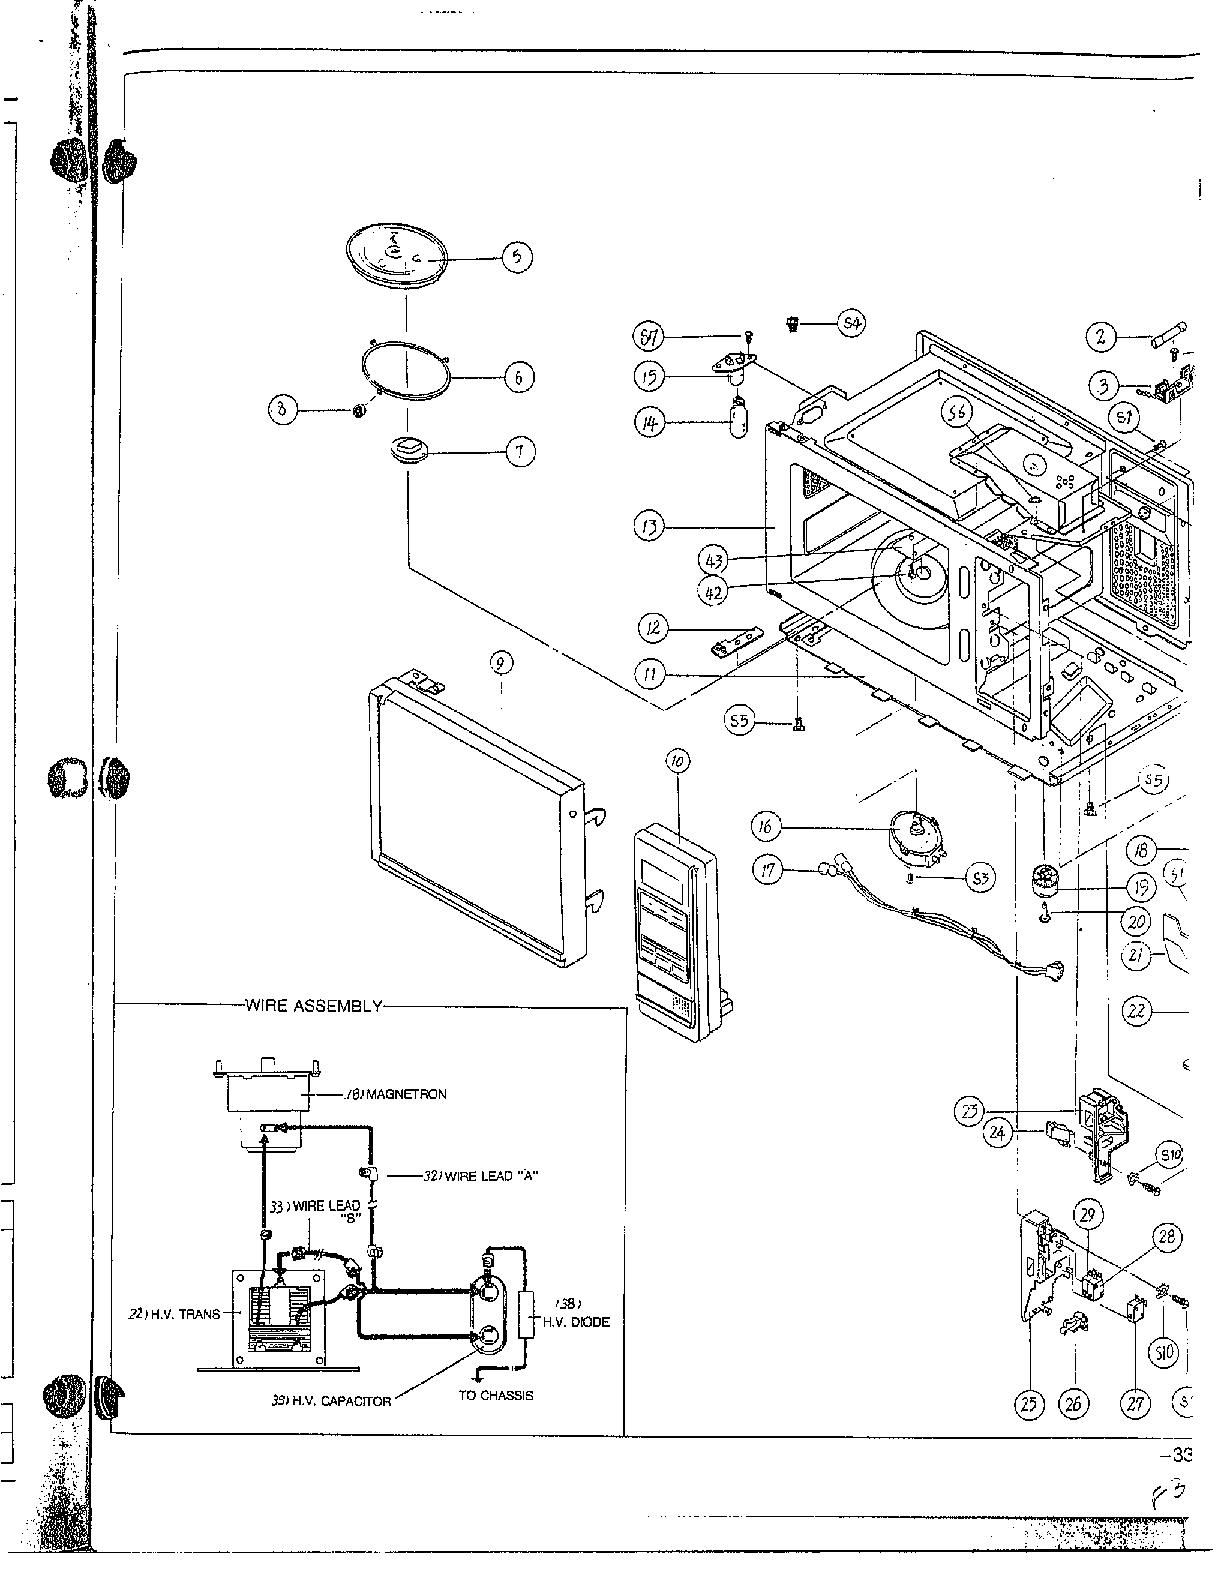 hight resolution of samsung microwave schematic wiring diagram origin samsung elec diagrams samsung microwave diagrams